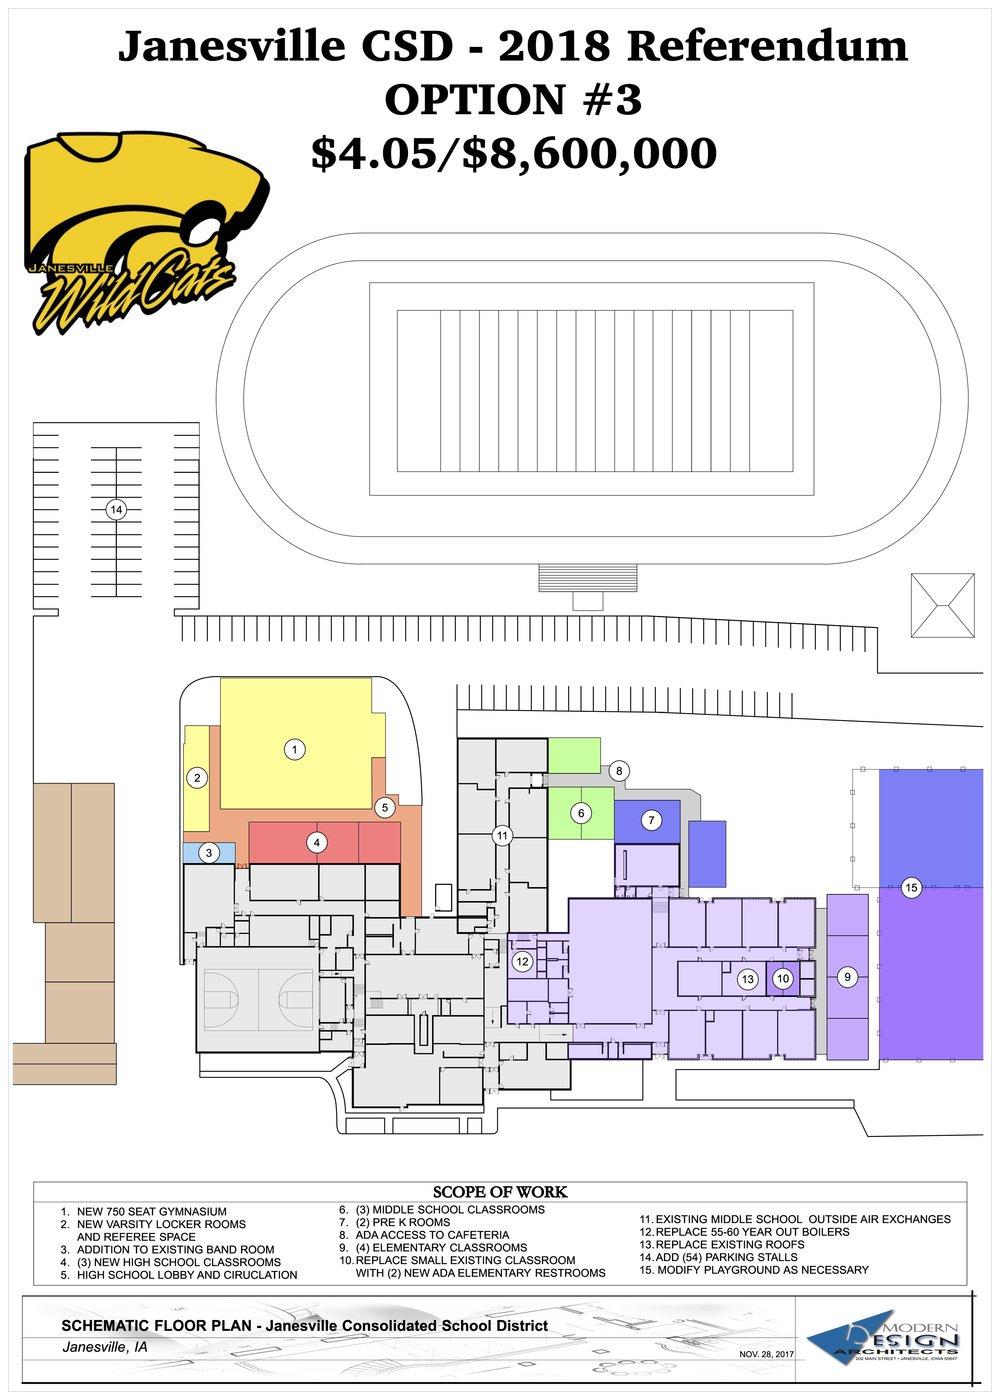 Janesville Plan 11-28-17 OPTION #3.jpg